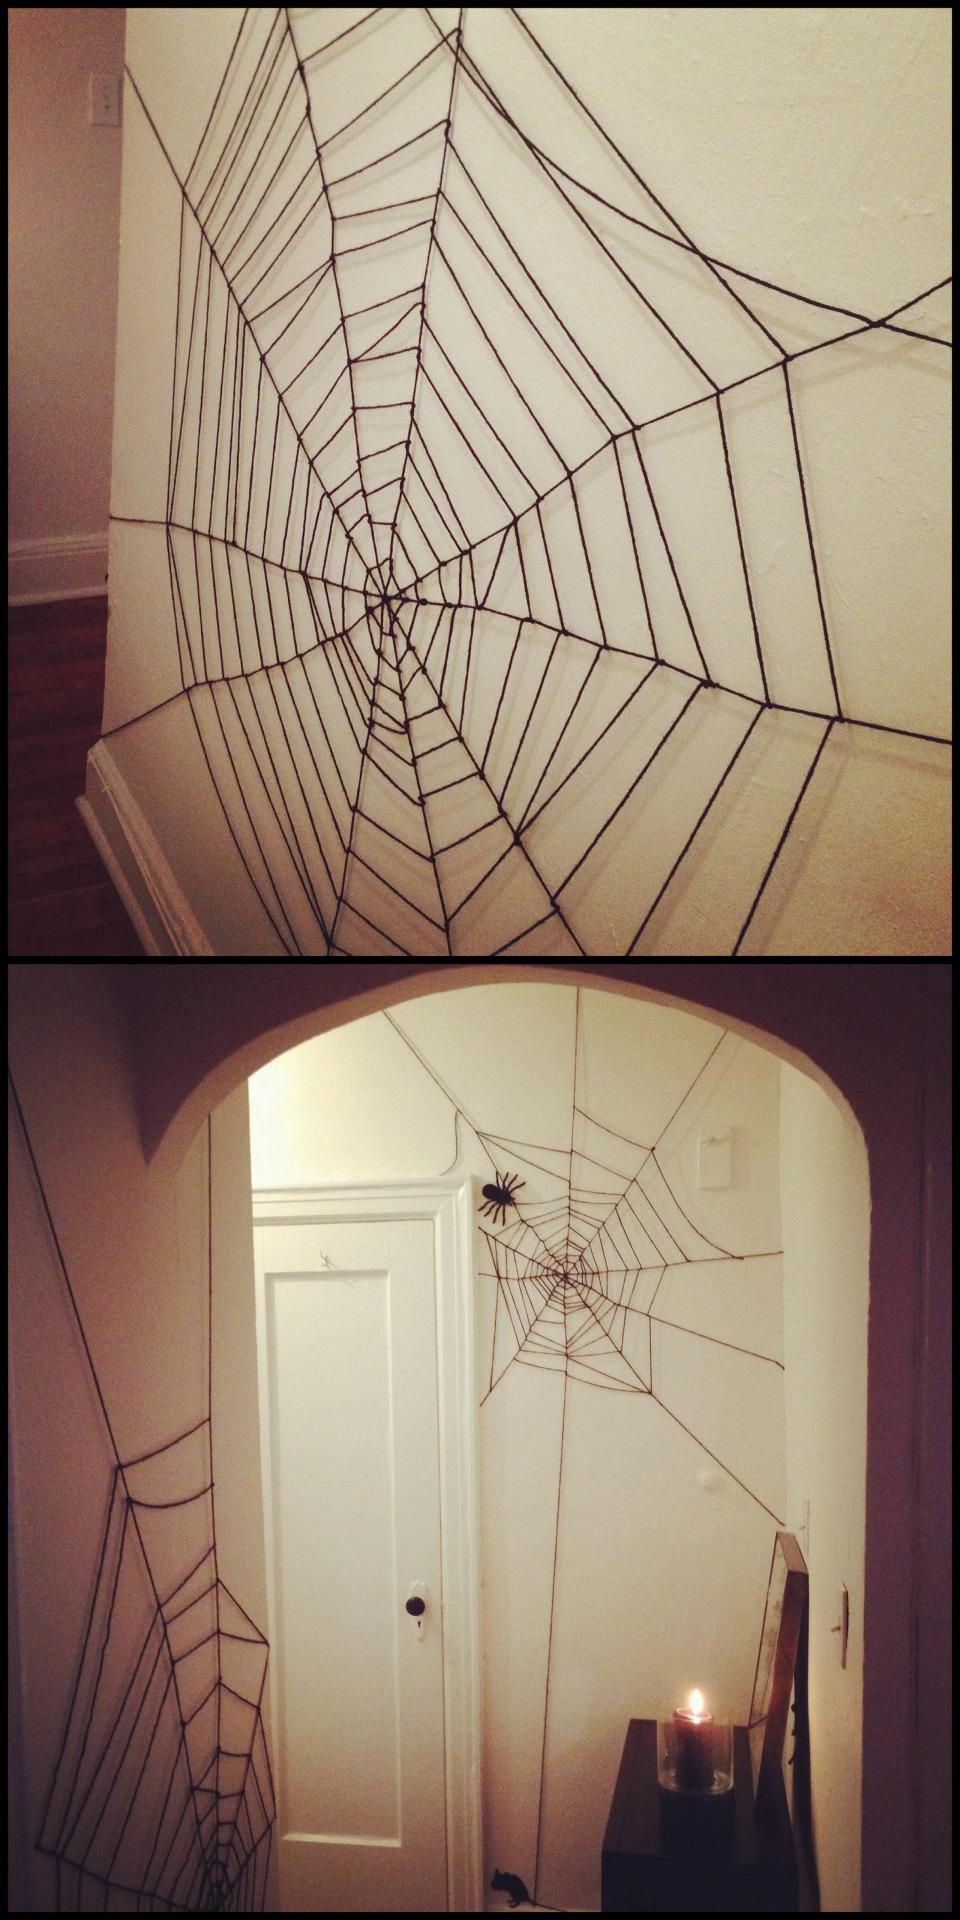 yarn spider webs.jpg